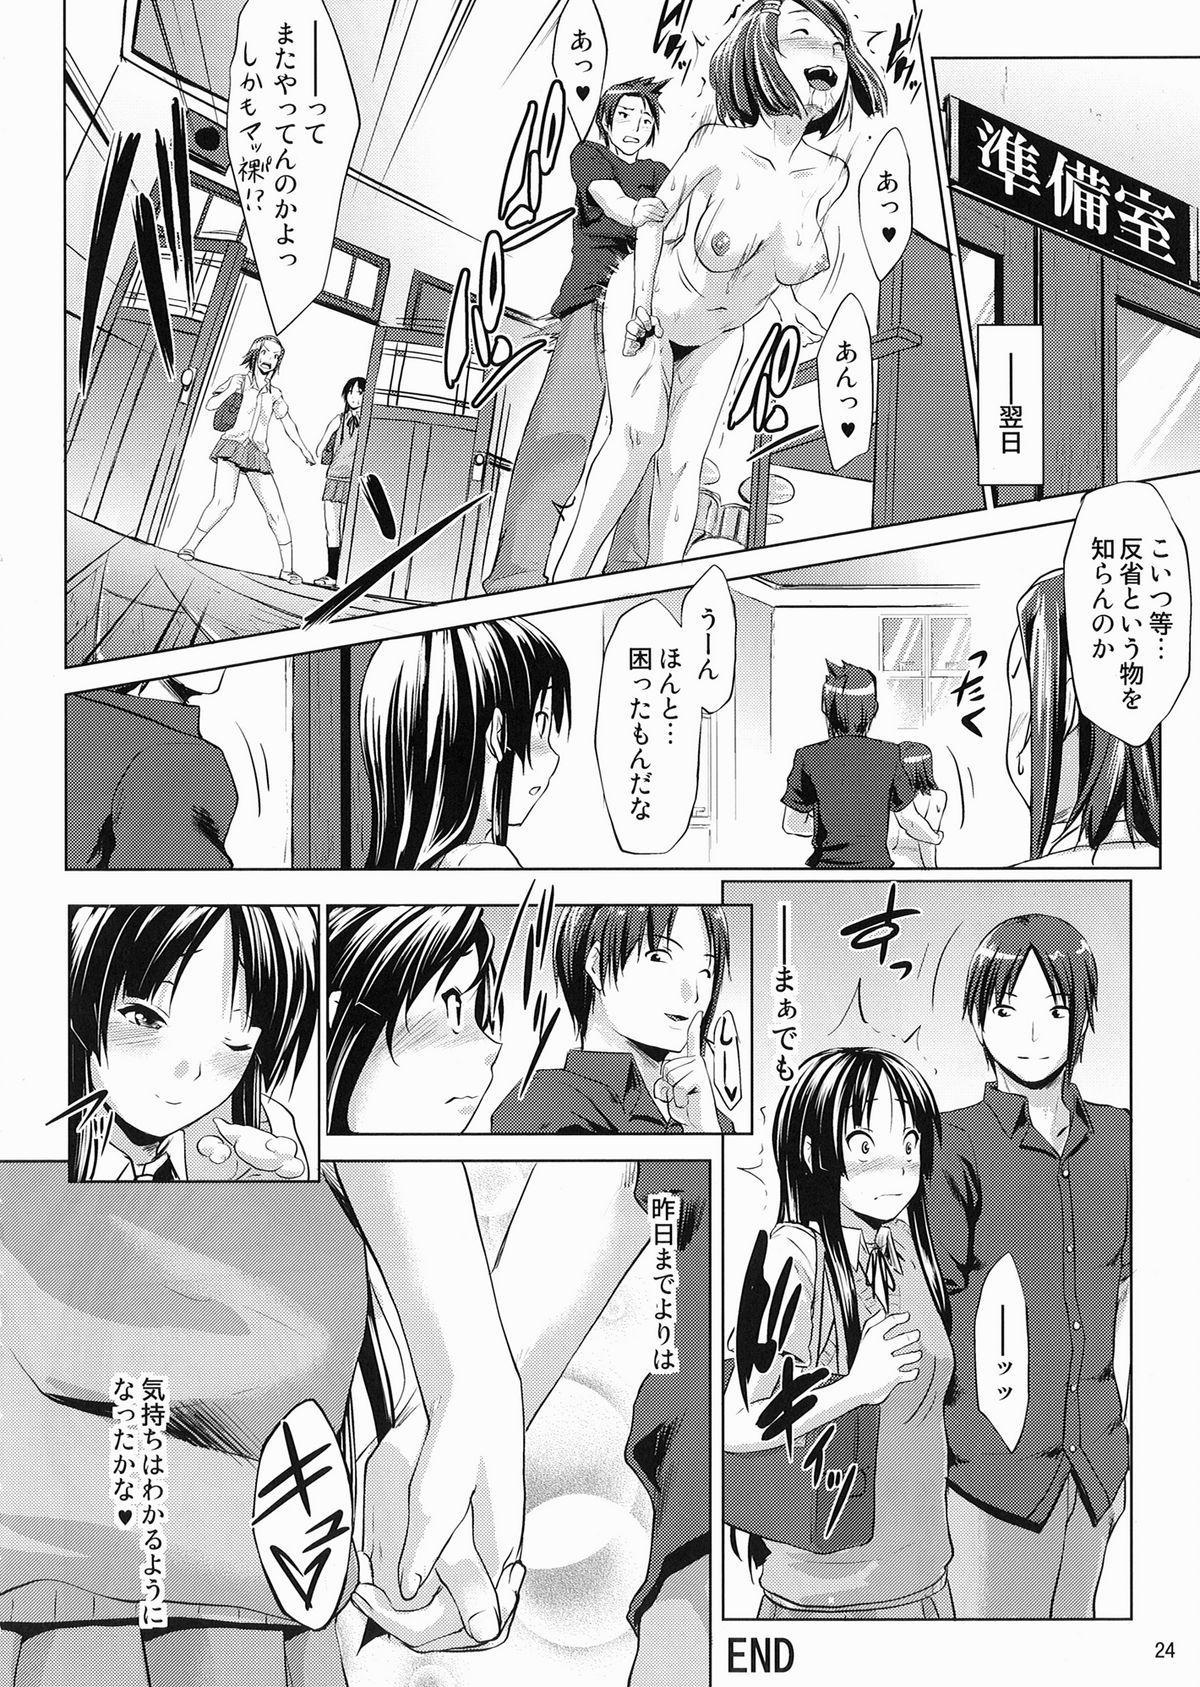 SukiSuki ☆ Elizabeth 23